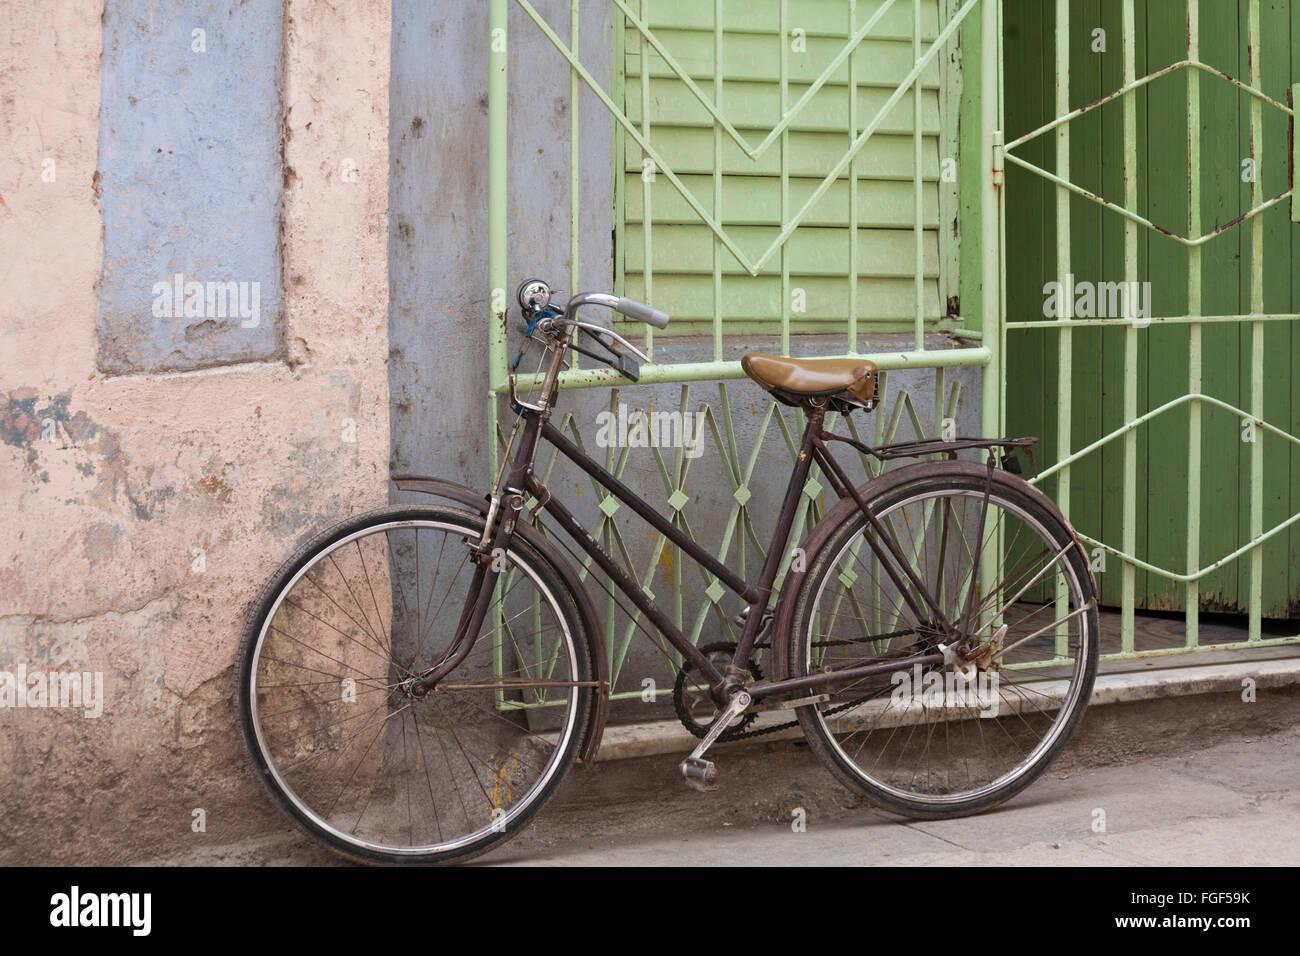 Daily life in Cuba - bicycle bike leant against green wrought iron metal railings at Havana, Cuba, West Indies, - Stock Image